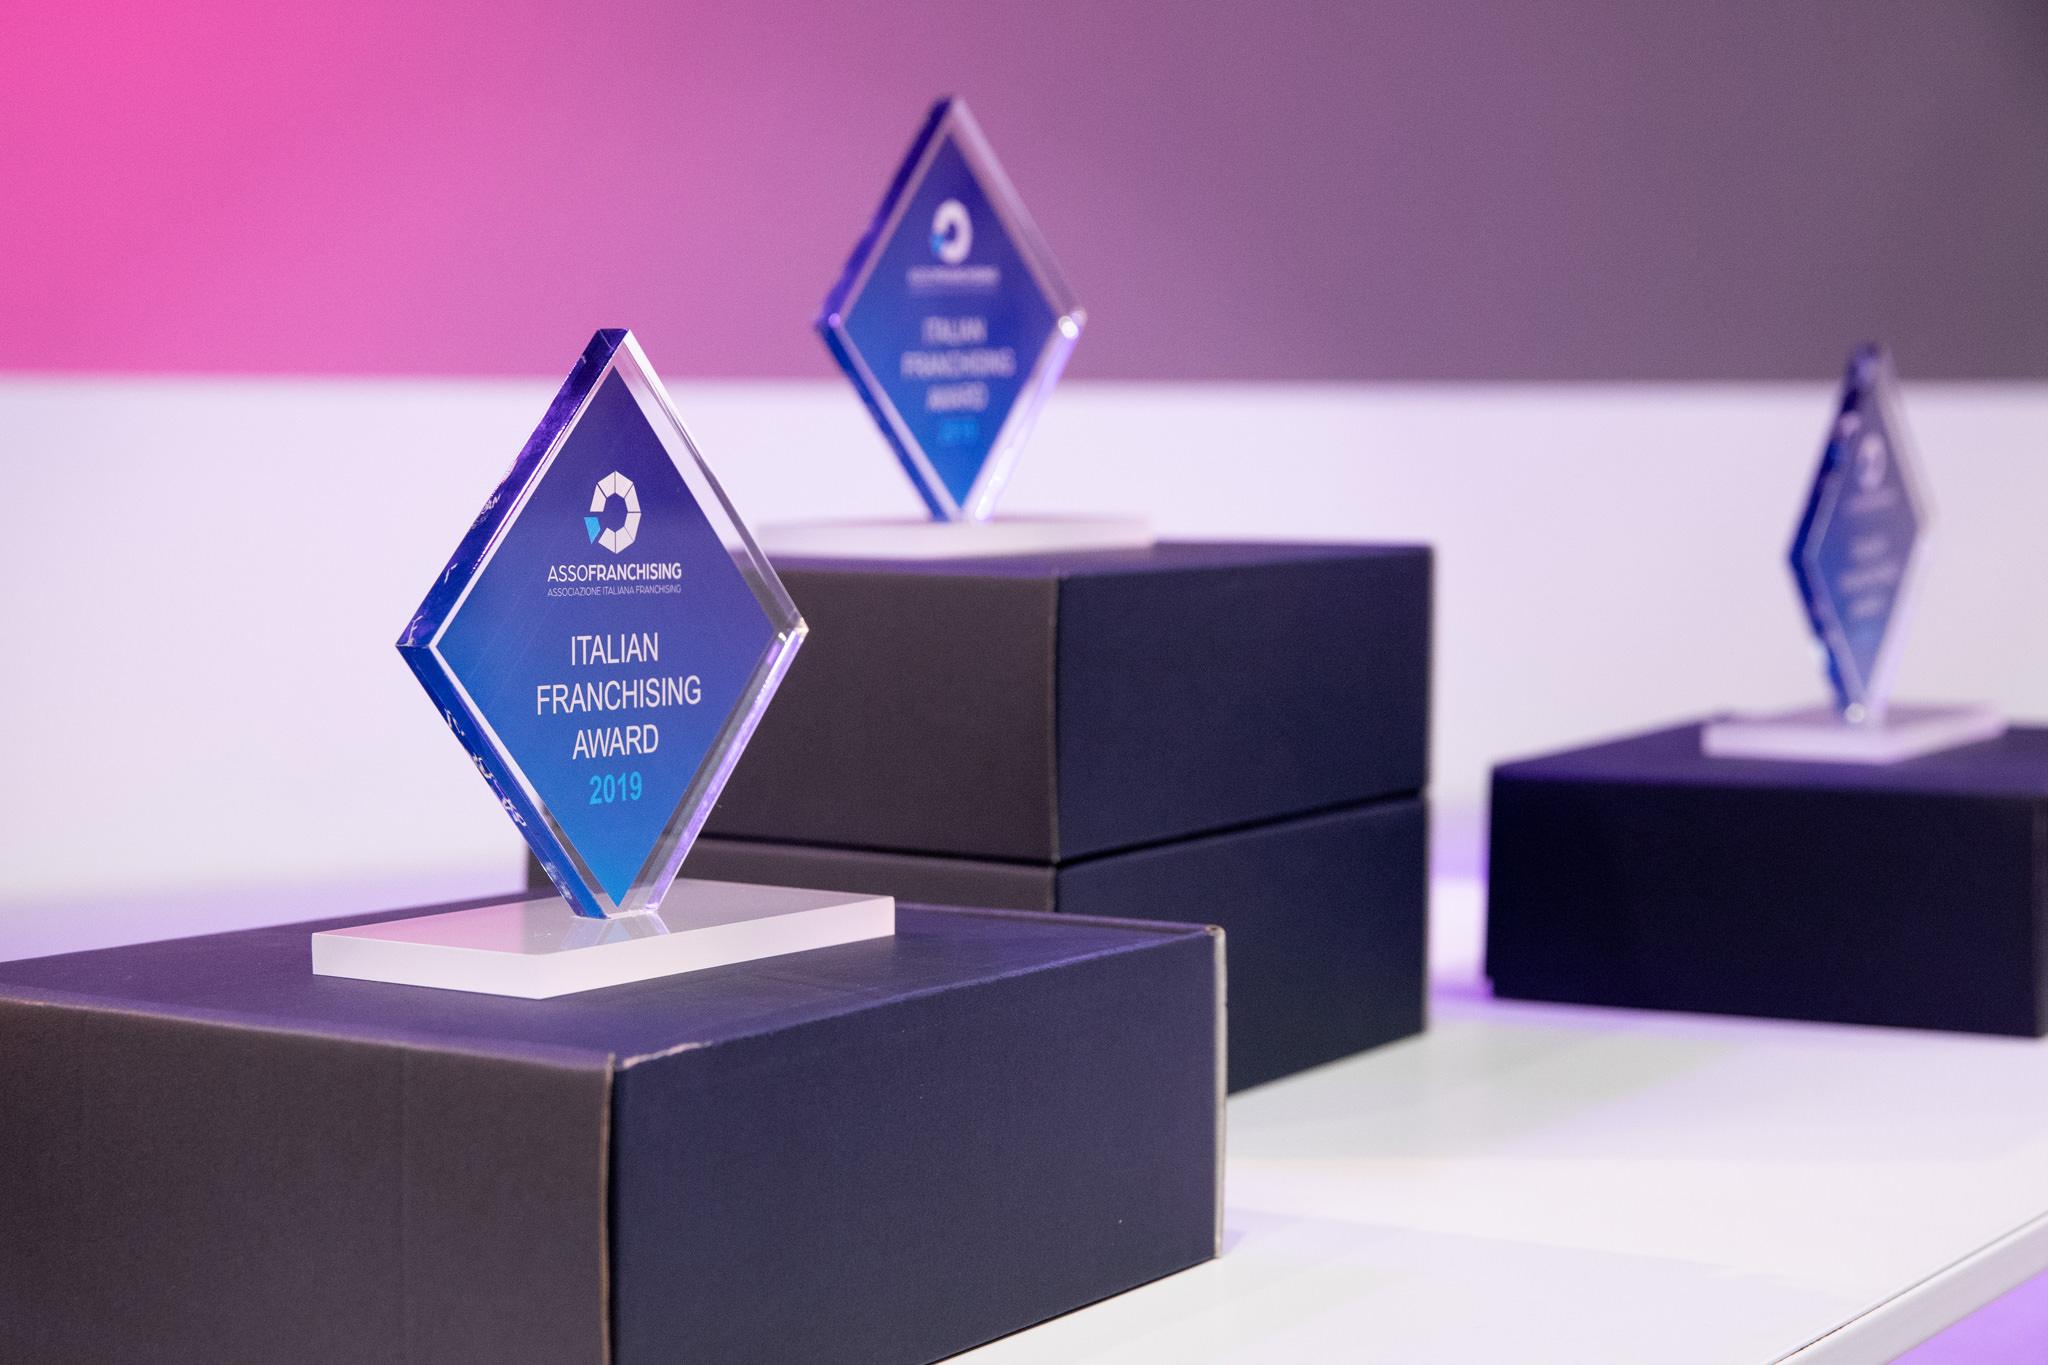 Il premio Assofranchising award 2019